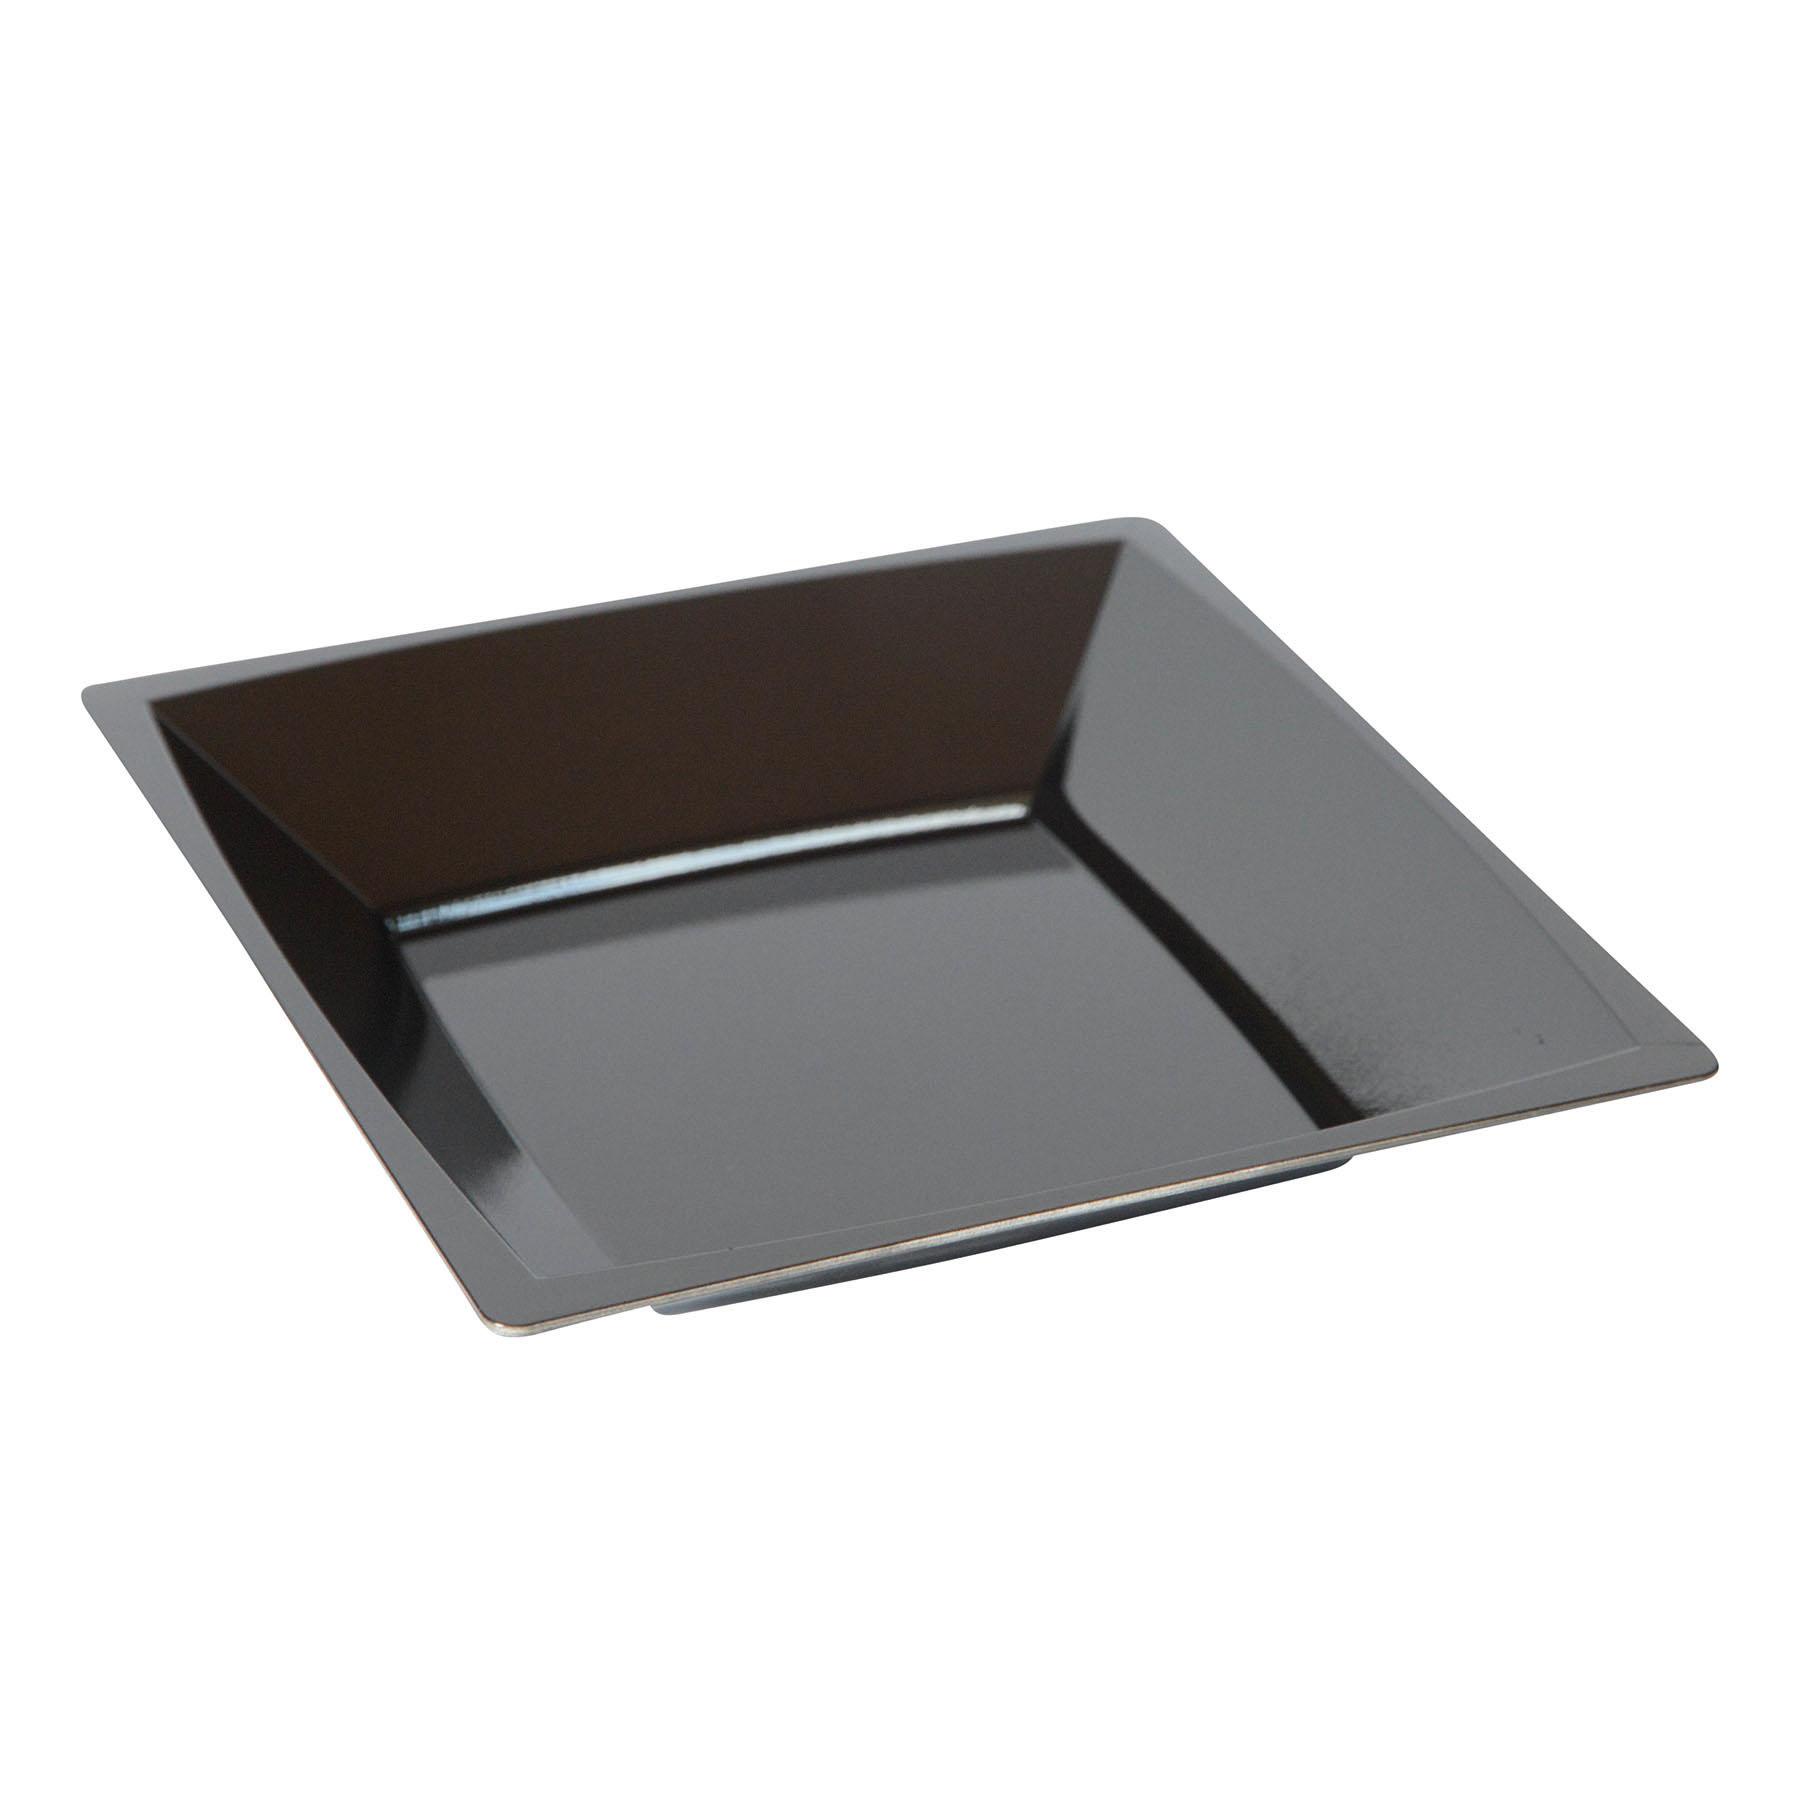 duni suppenteller milan m bei szymanek online kaufen. Black Bedroom Furniture Sets. Home Design Ideas